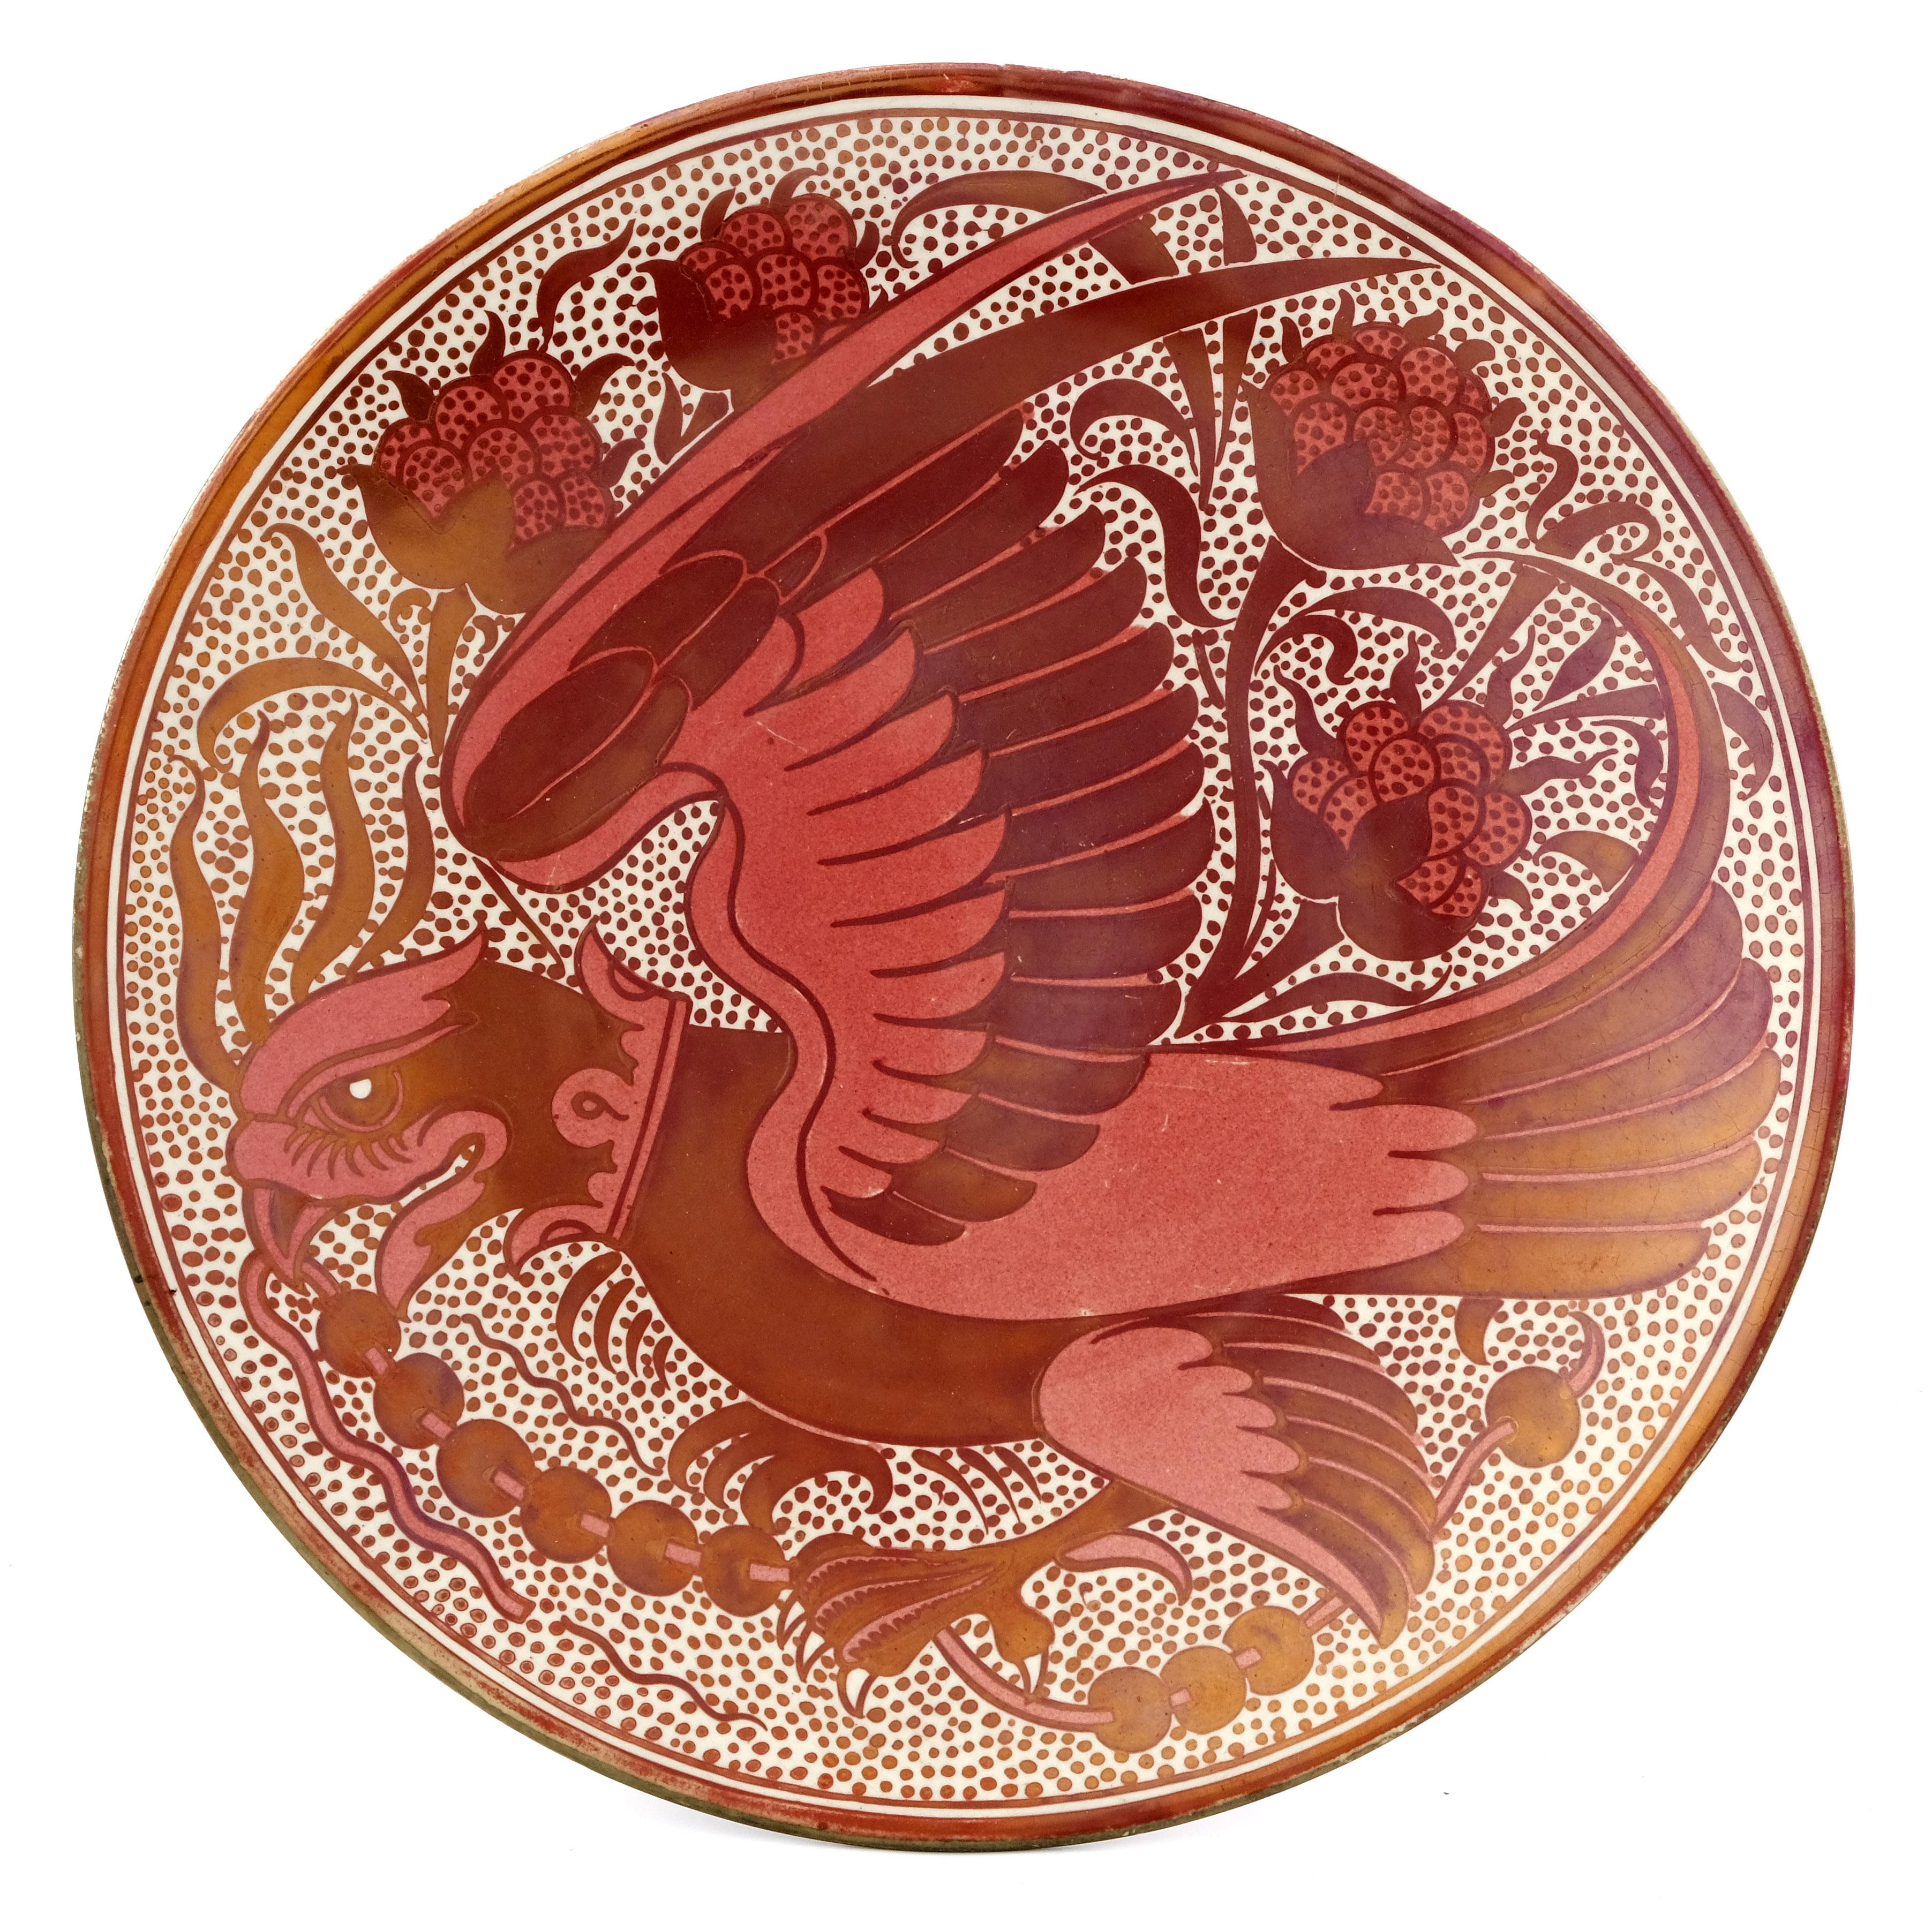 William De Morgan, a lustre plate